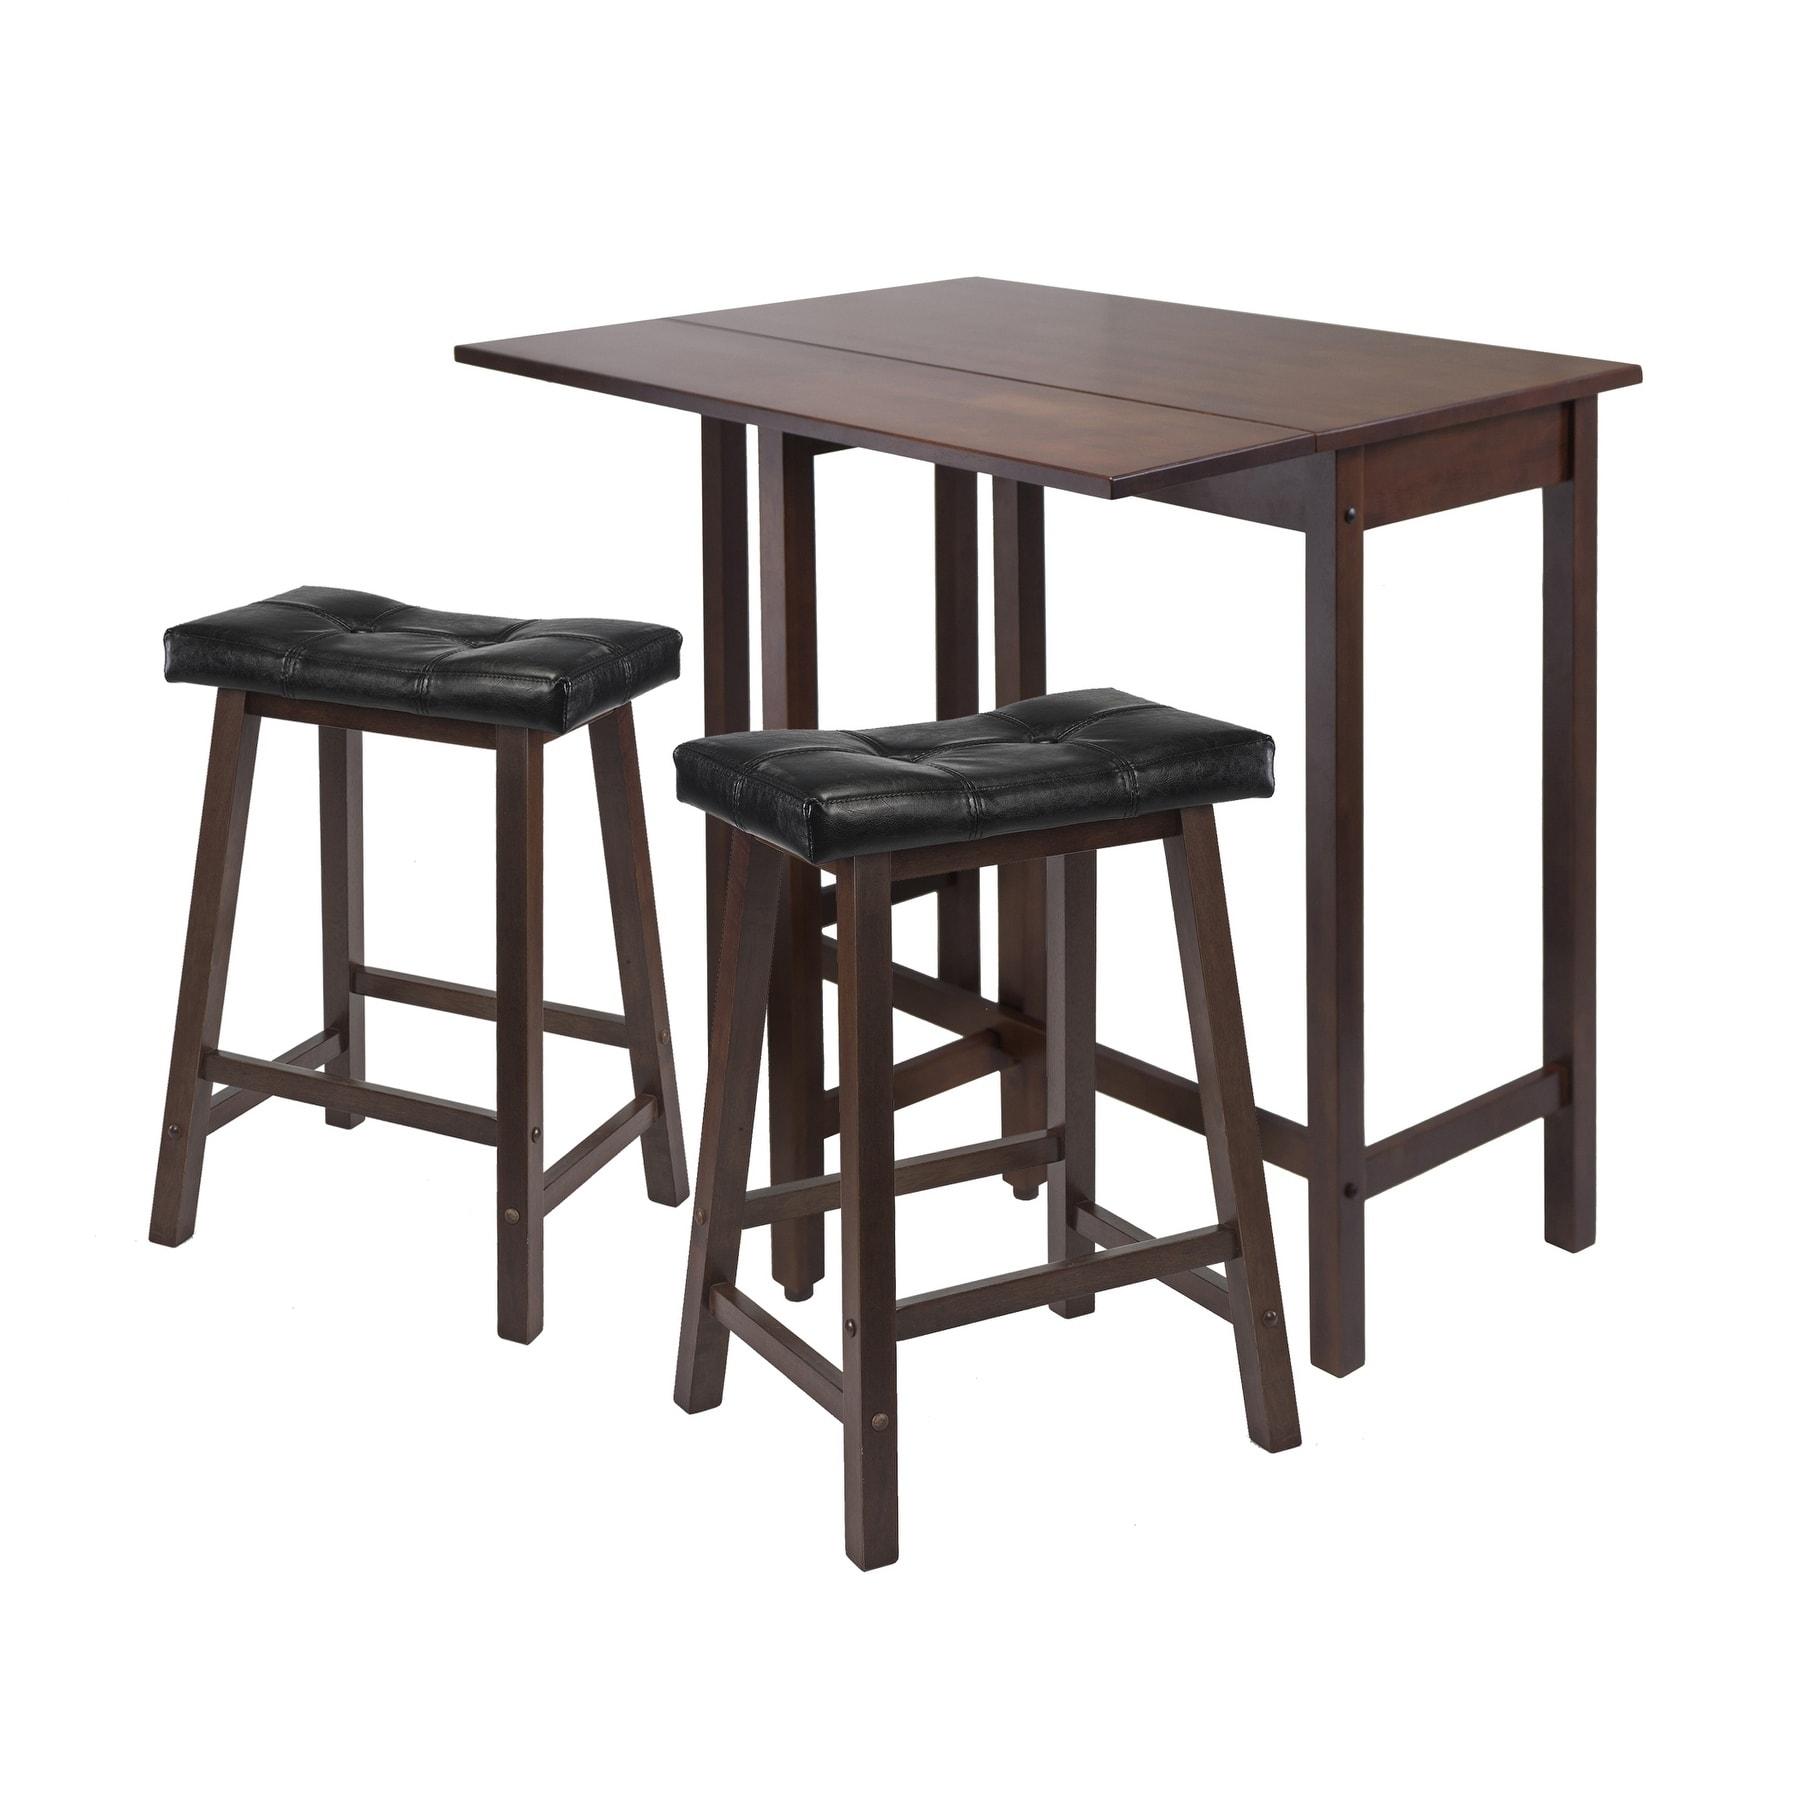 3Pc Lynnwood Drop Leaf Kitchen Table with 2 Cushion Saddle Seat Stools